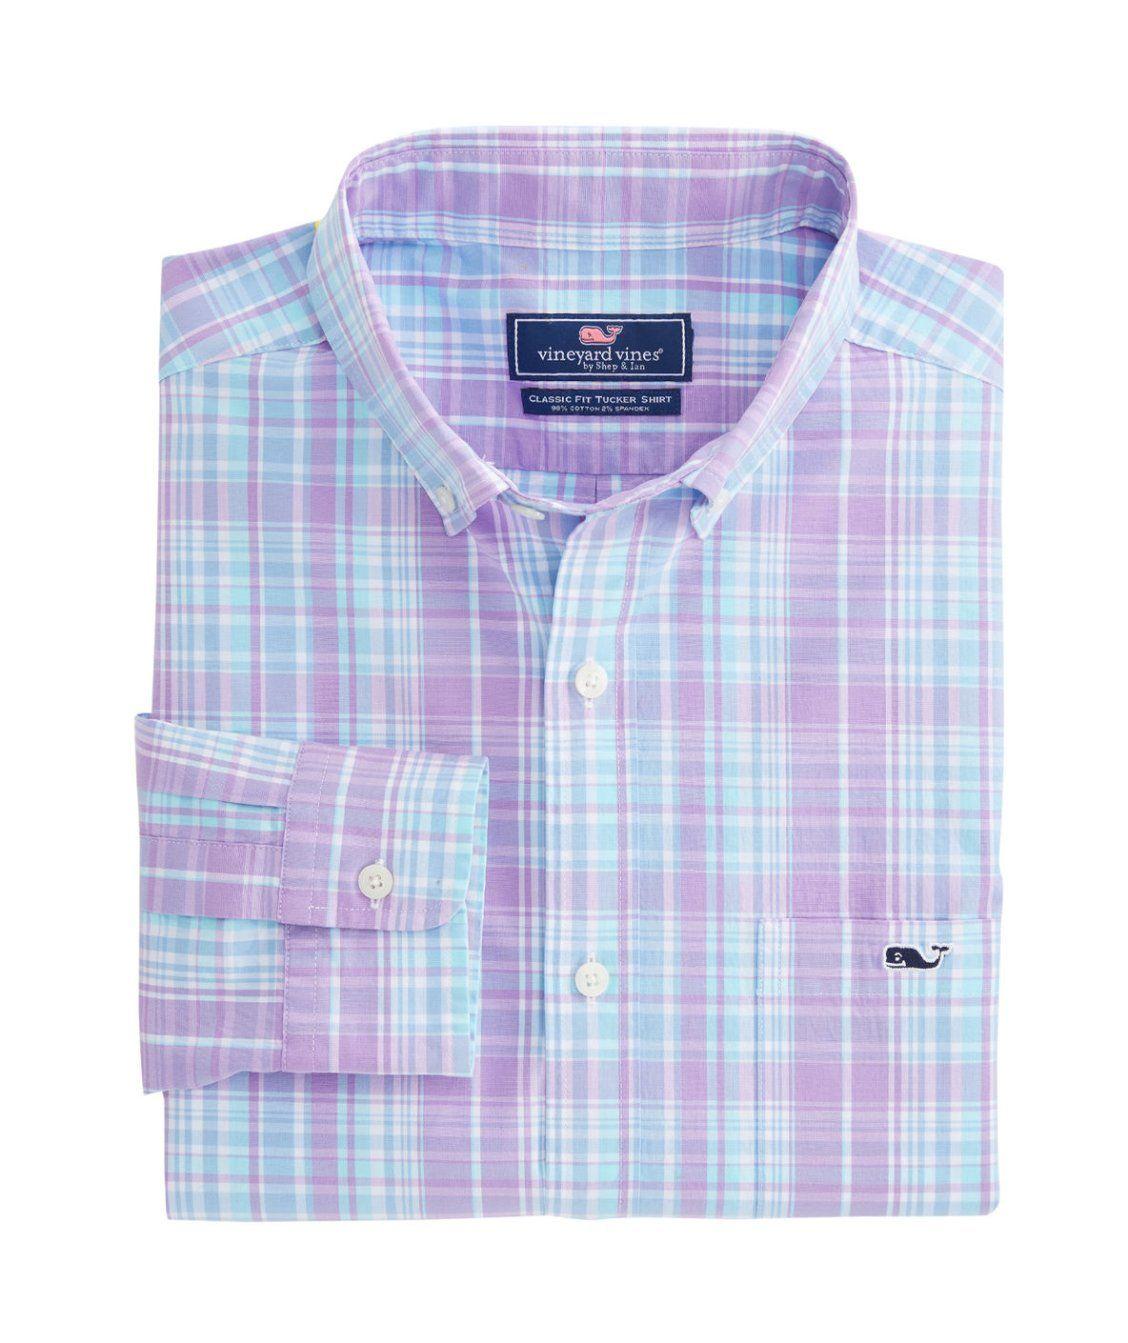 f9a5c03b1 New Providence Plaid Classic Tucker Shirt   new arrivals   Shirts ...